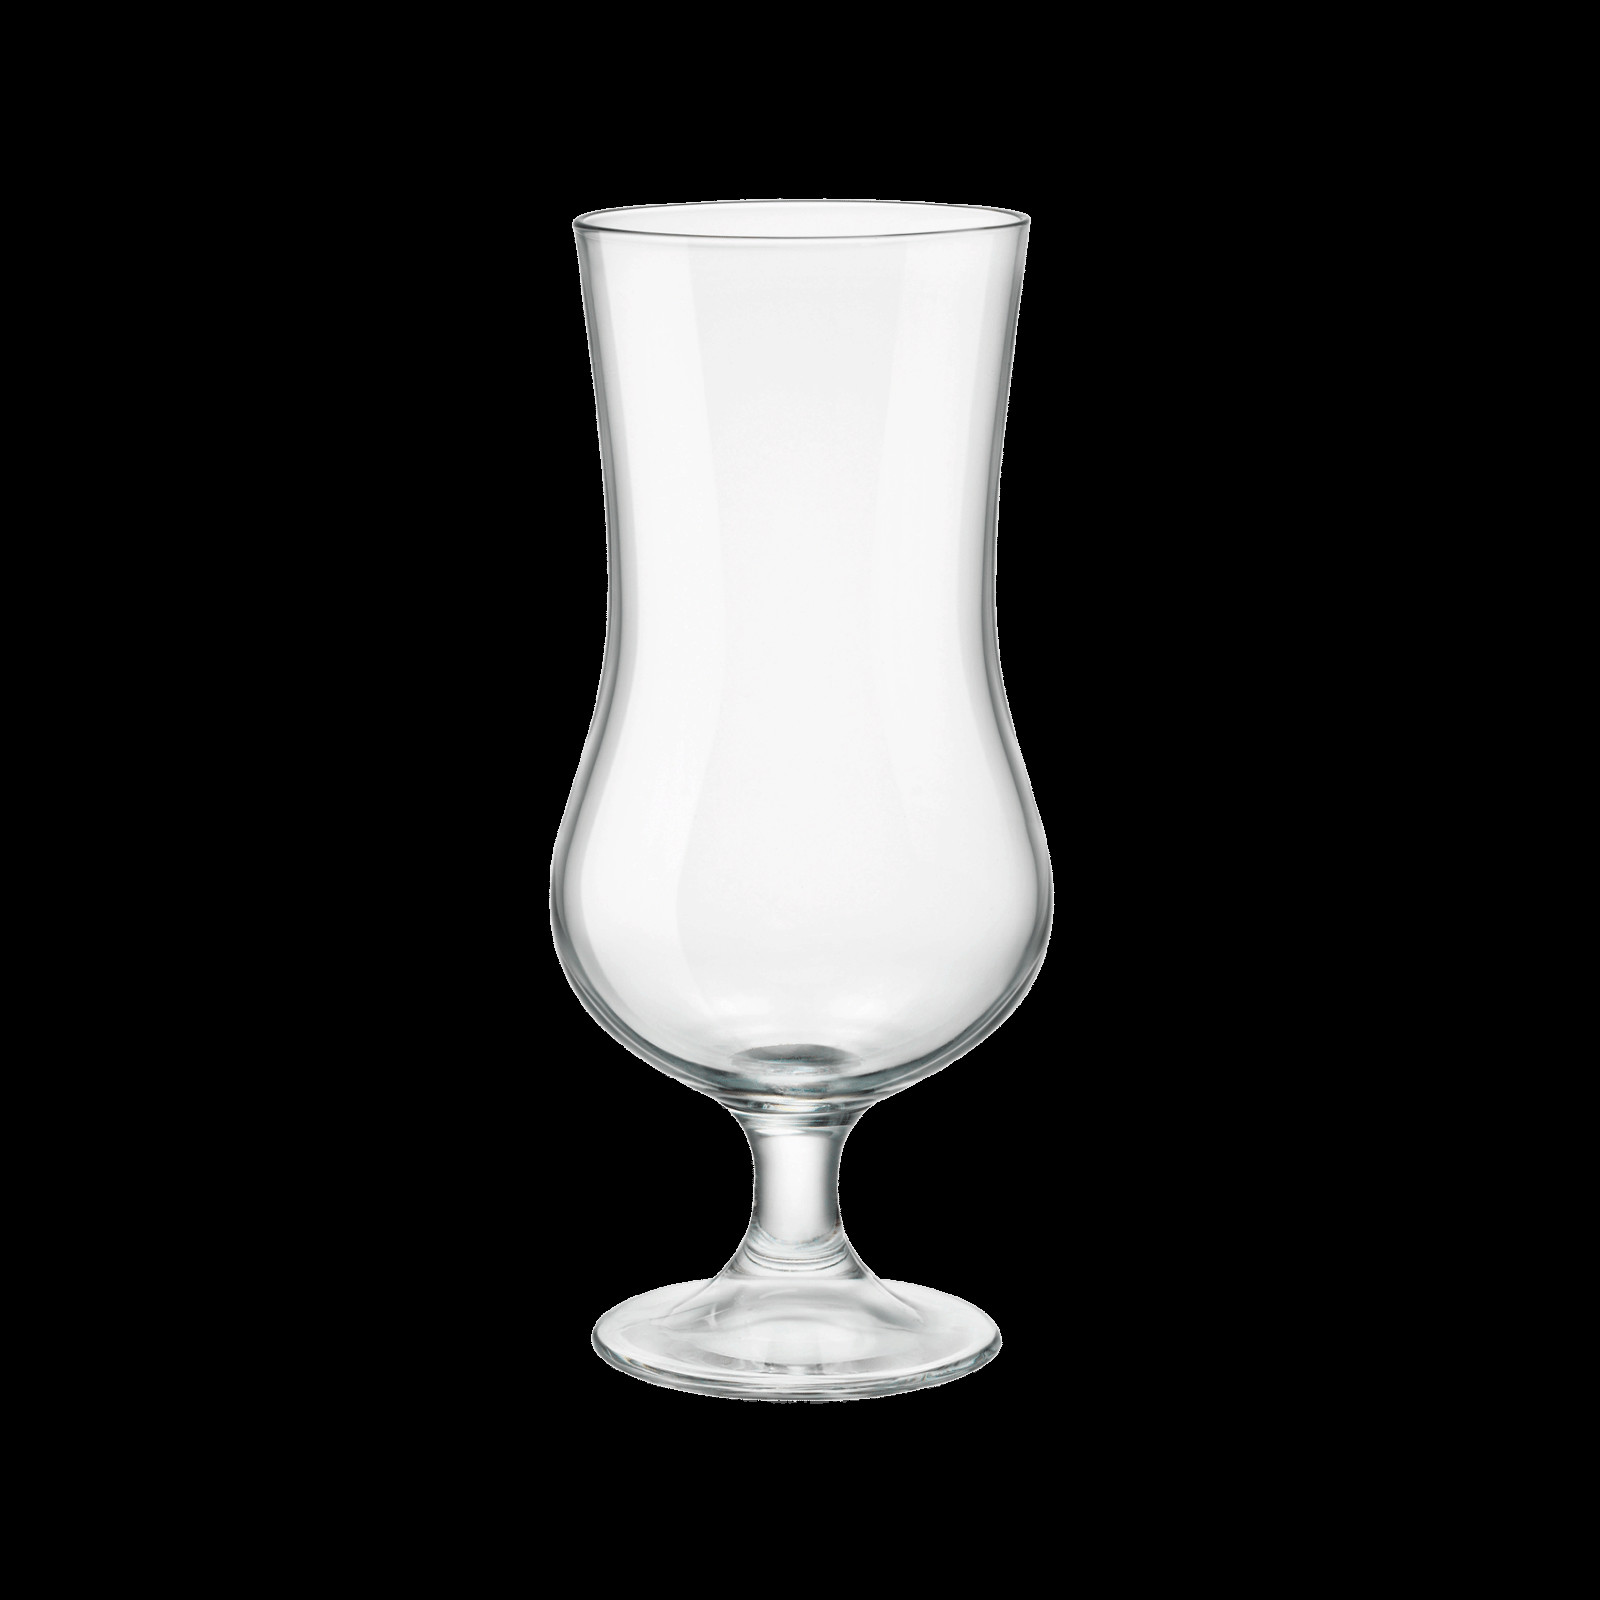 milk glass vases wholesale of archivi products bormioli rocco regarding small beer glass